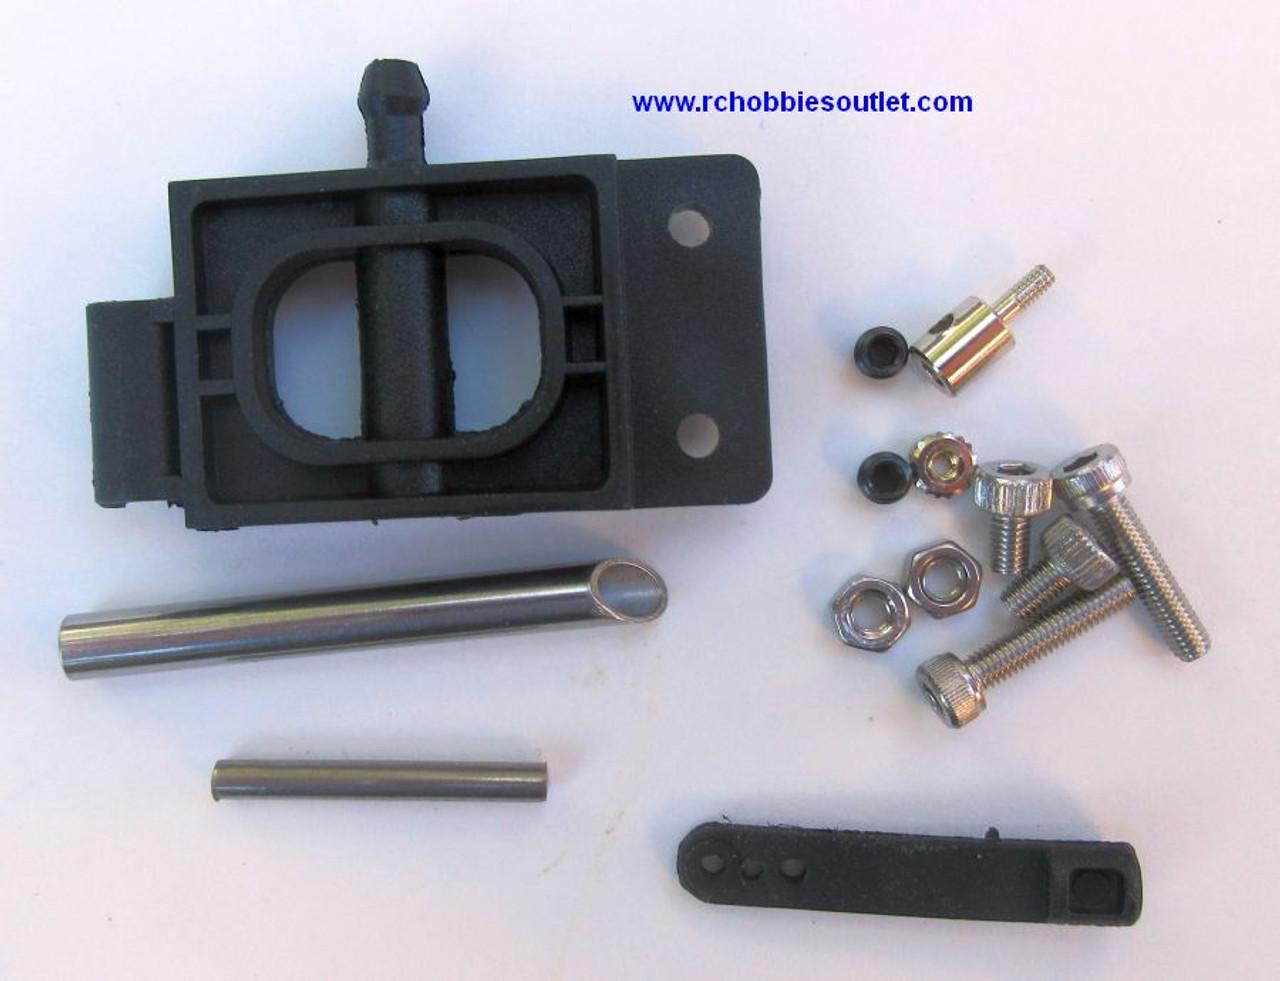 83018 Rudder Assembly  Plastic Bracket for 8301 Bullet 8302 US1  Joysway Boat